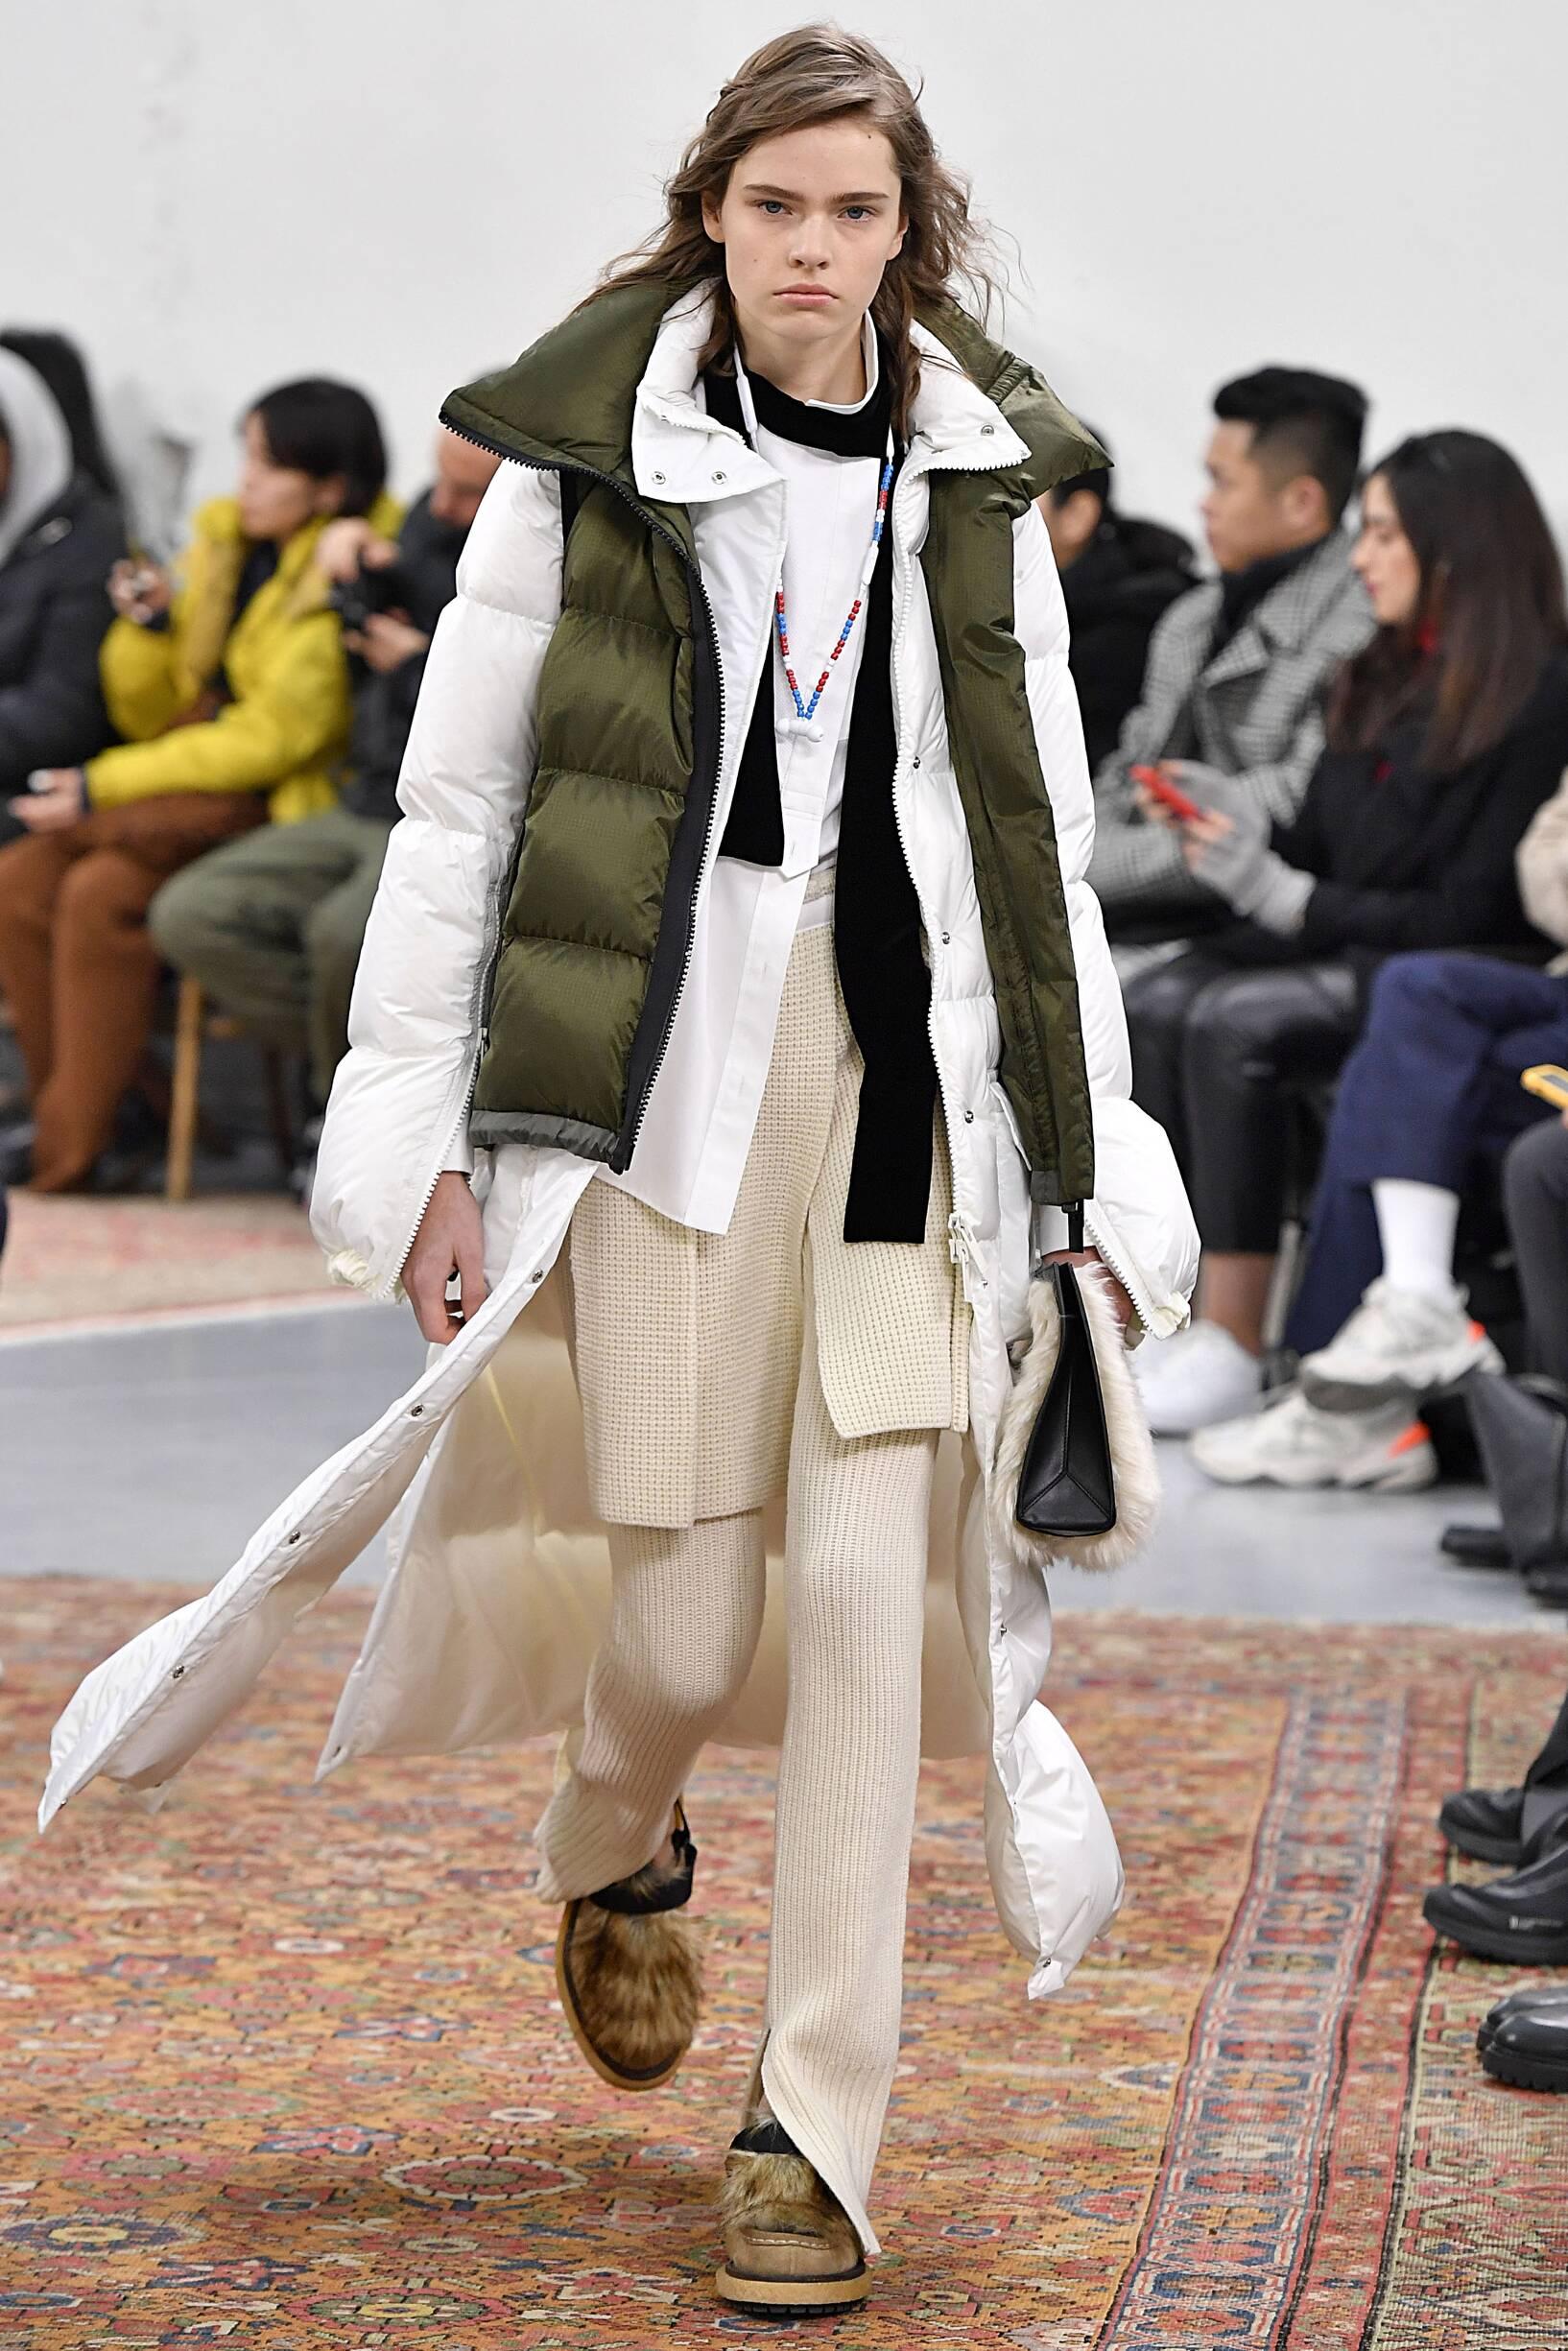 Sacai FW 2019 Womenswear